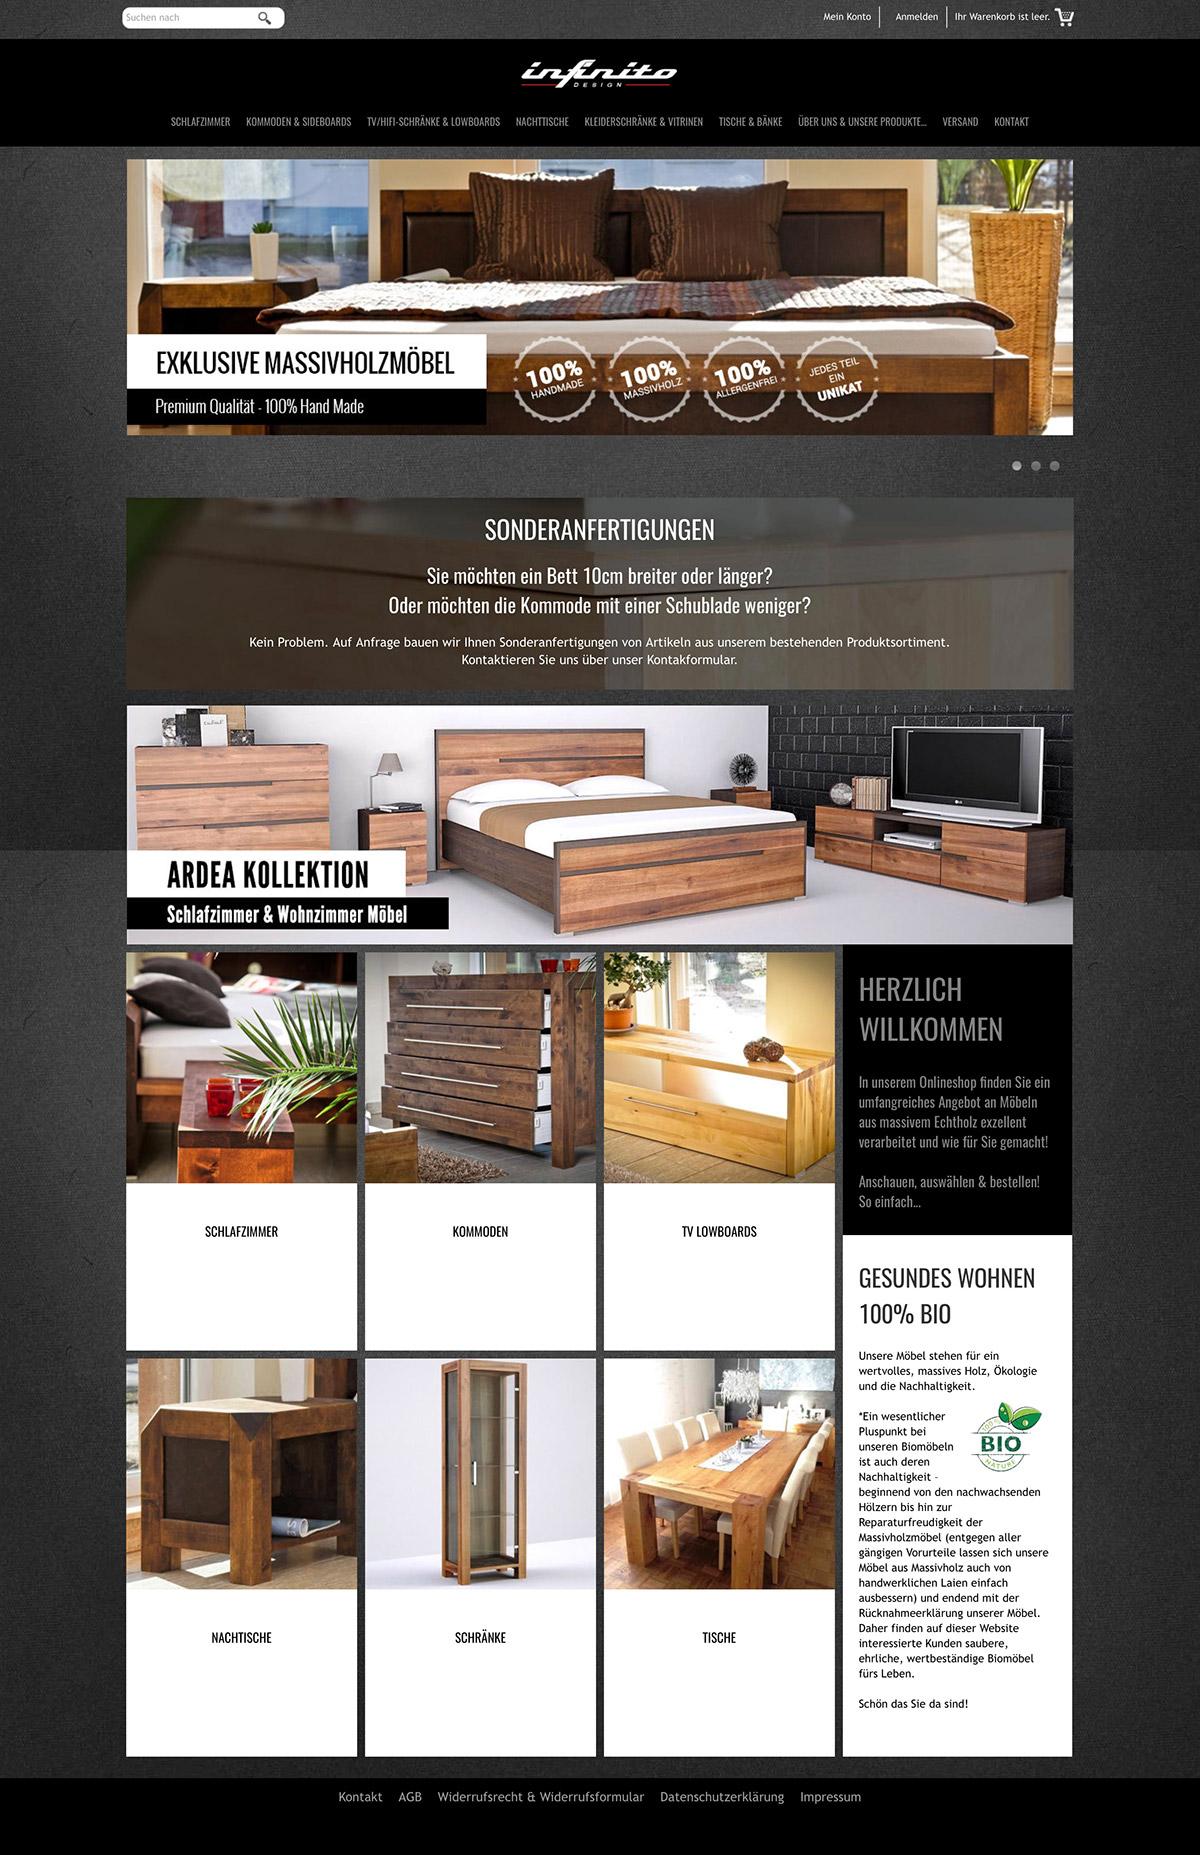 Shop Design - Infinito Design Shop on Behance